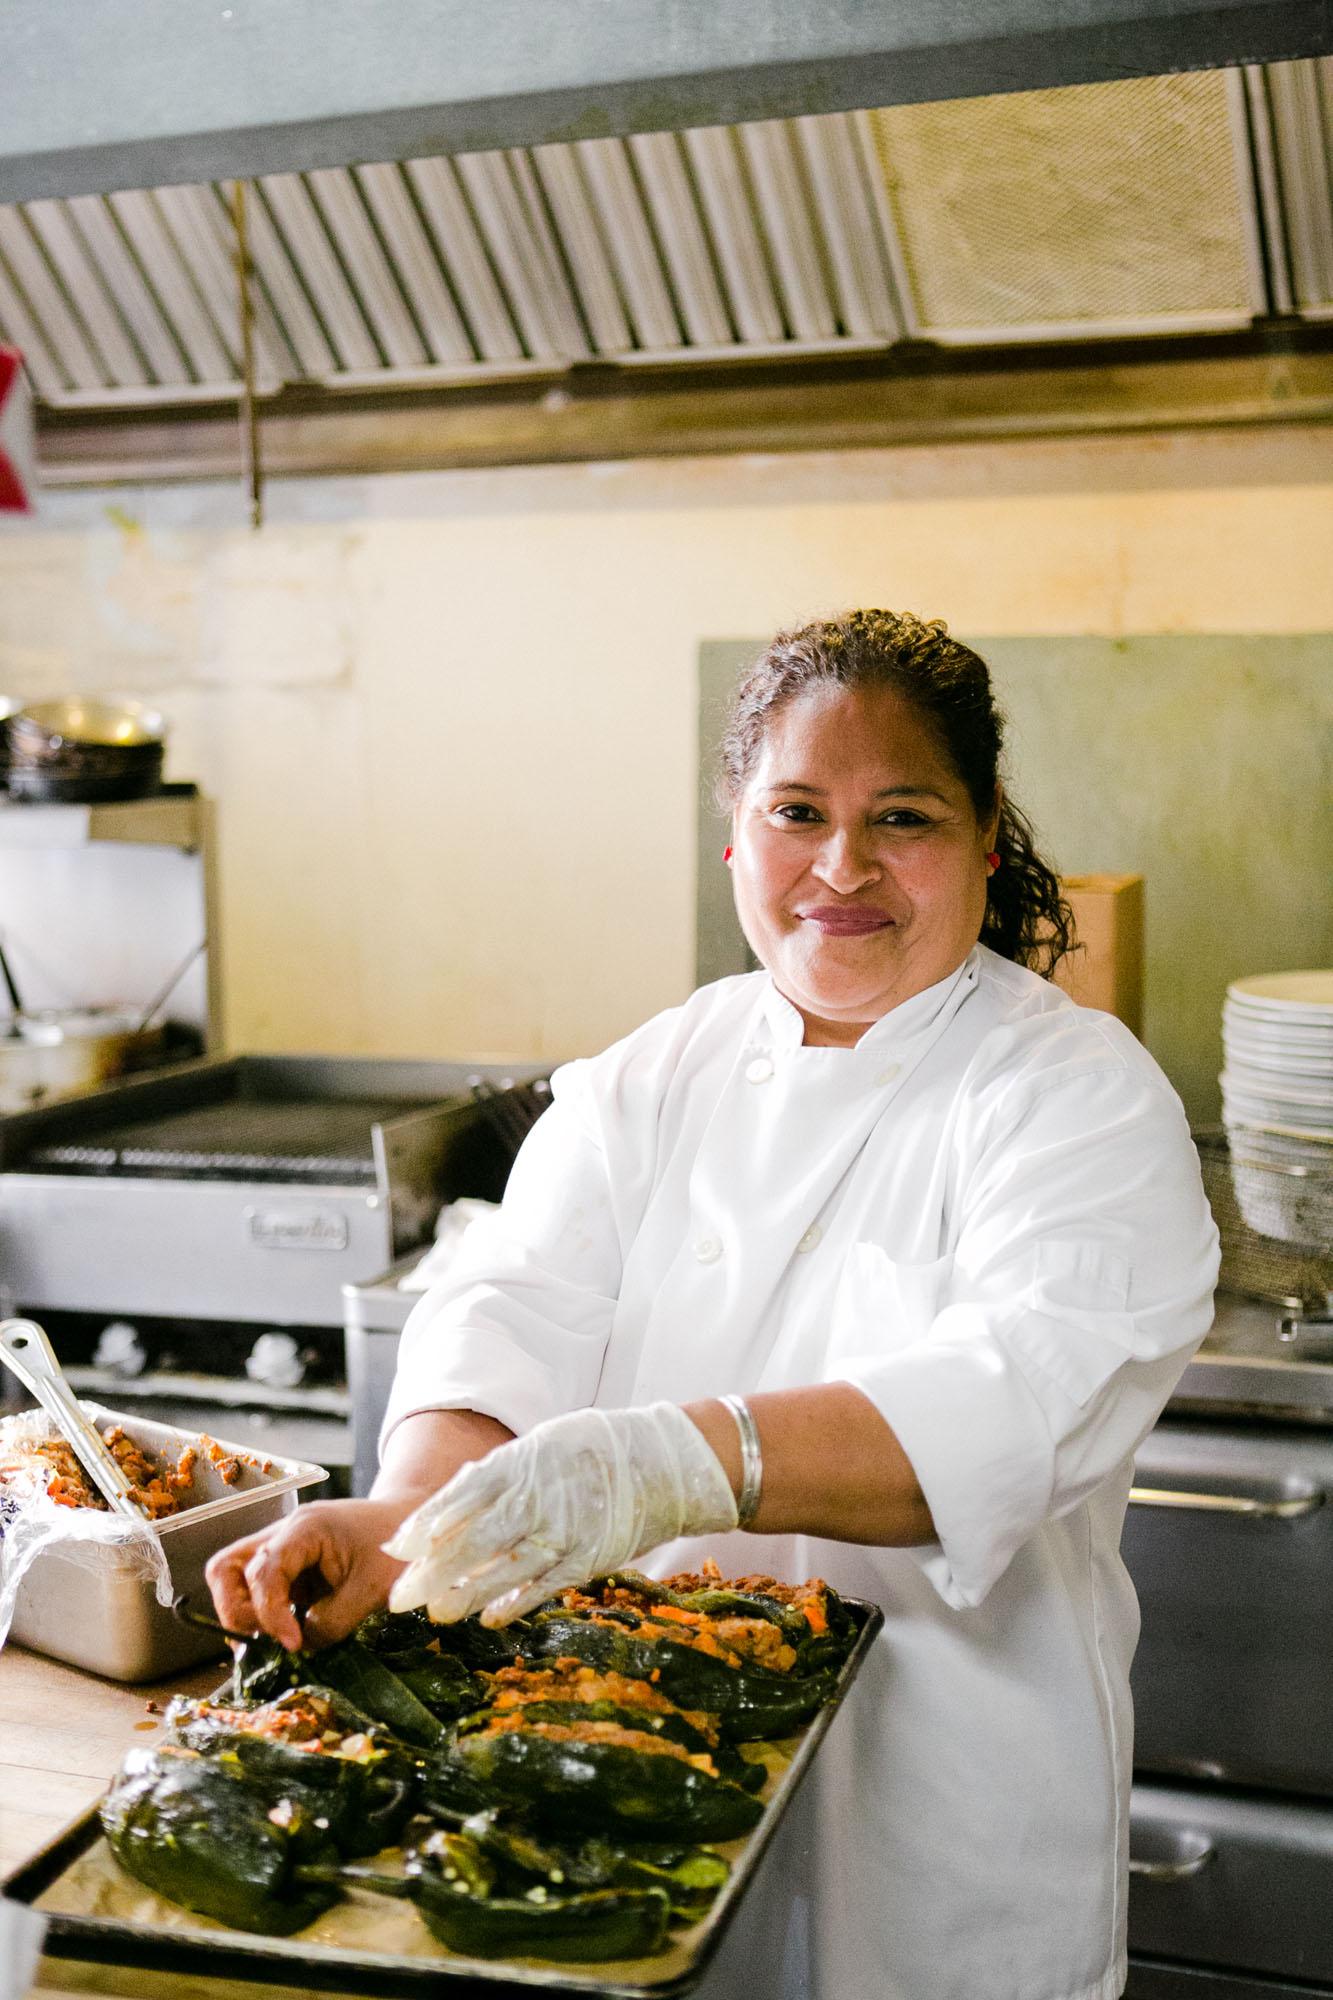 GabriellaCafe-chef-making-chile-rellenos.jpg